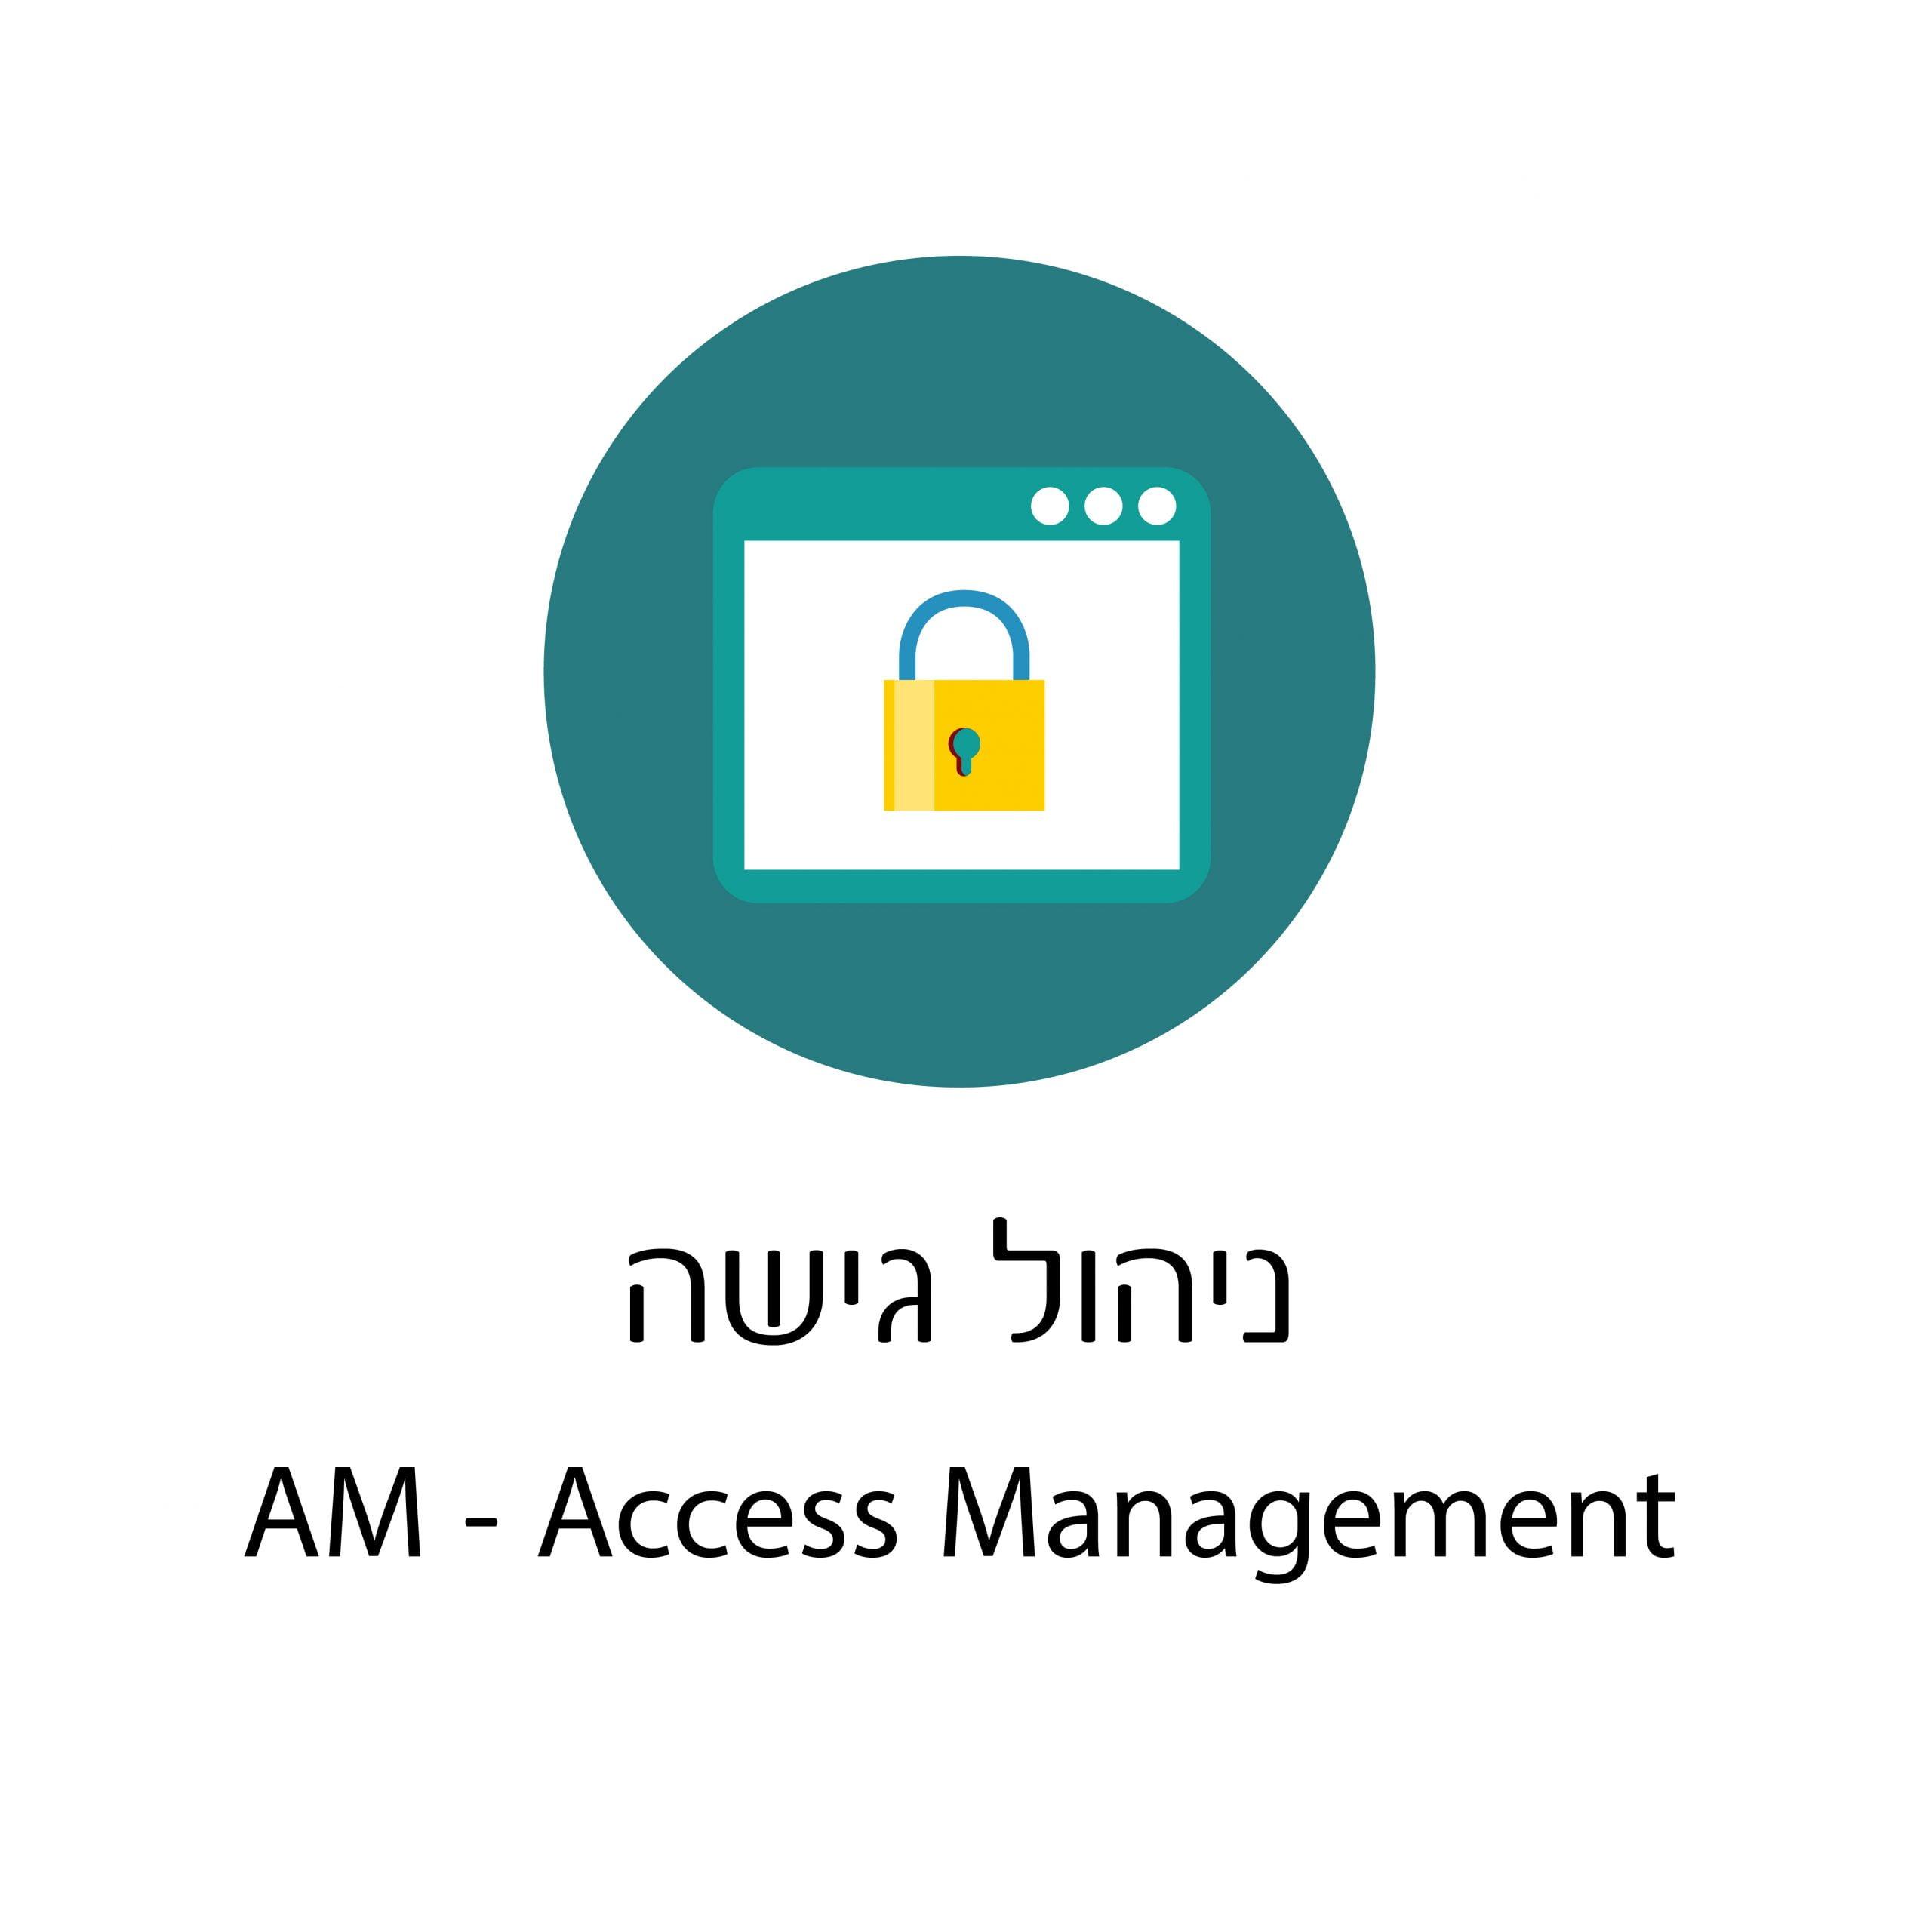 PAM ACCESS MANAGEMENT